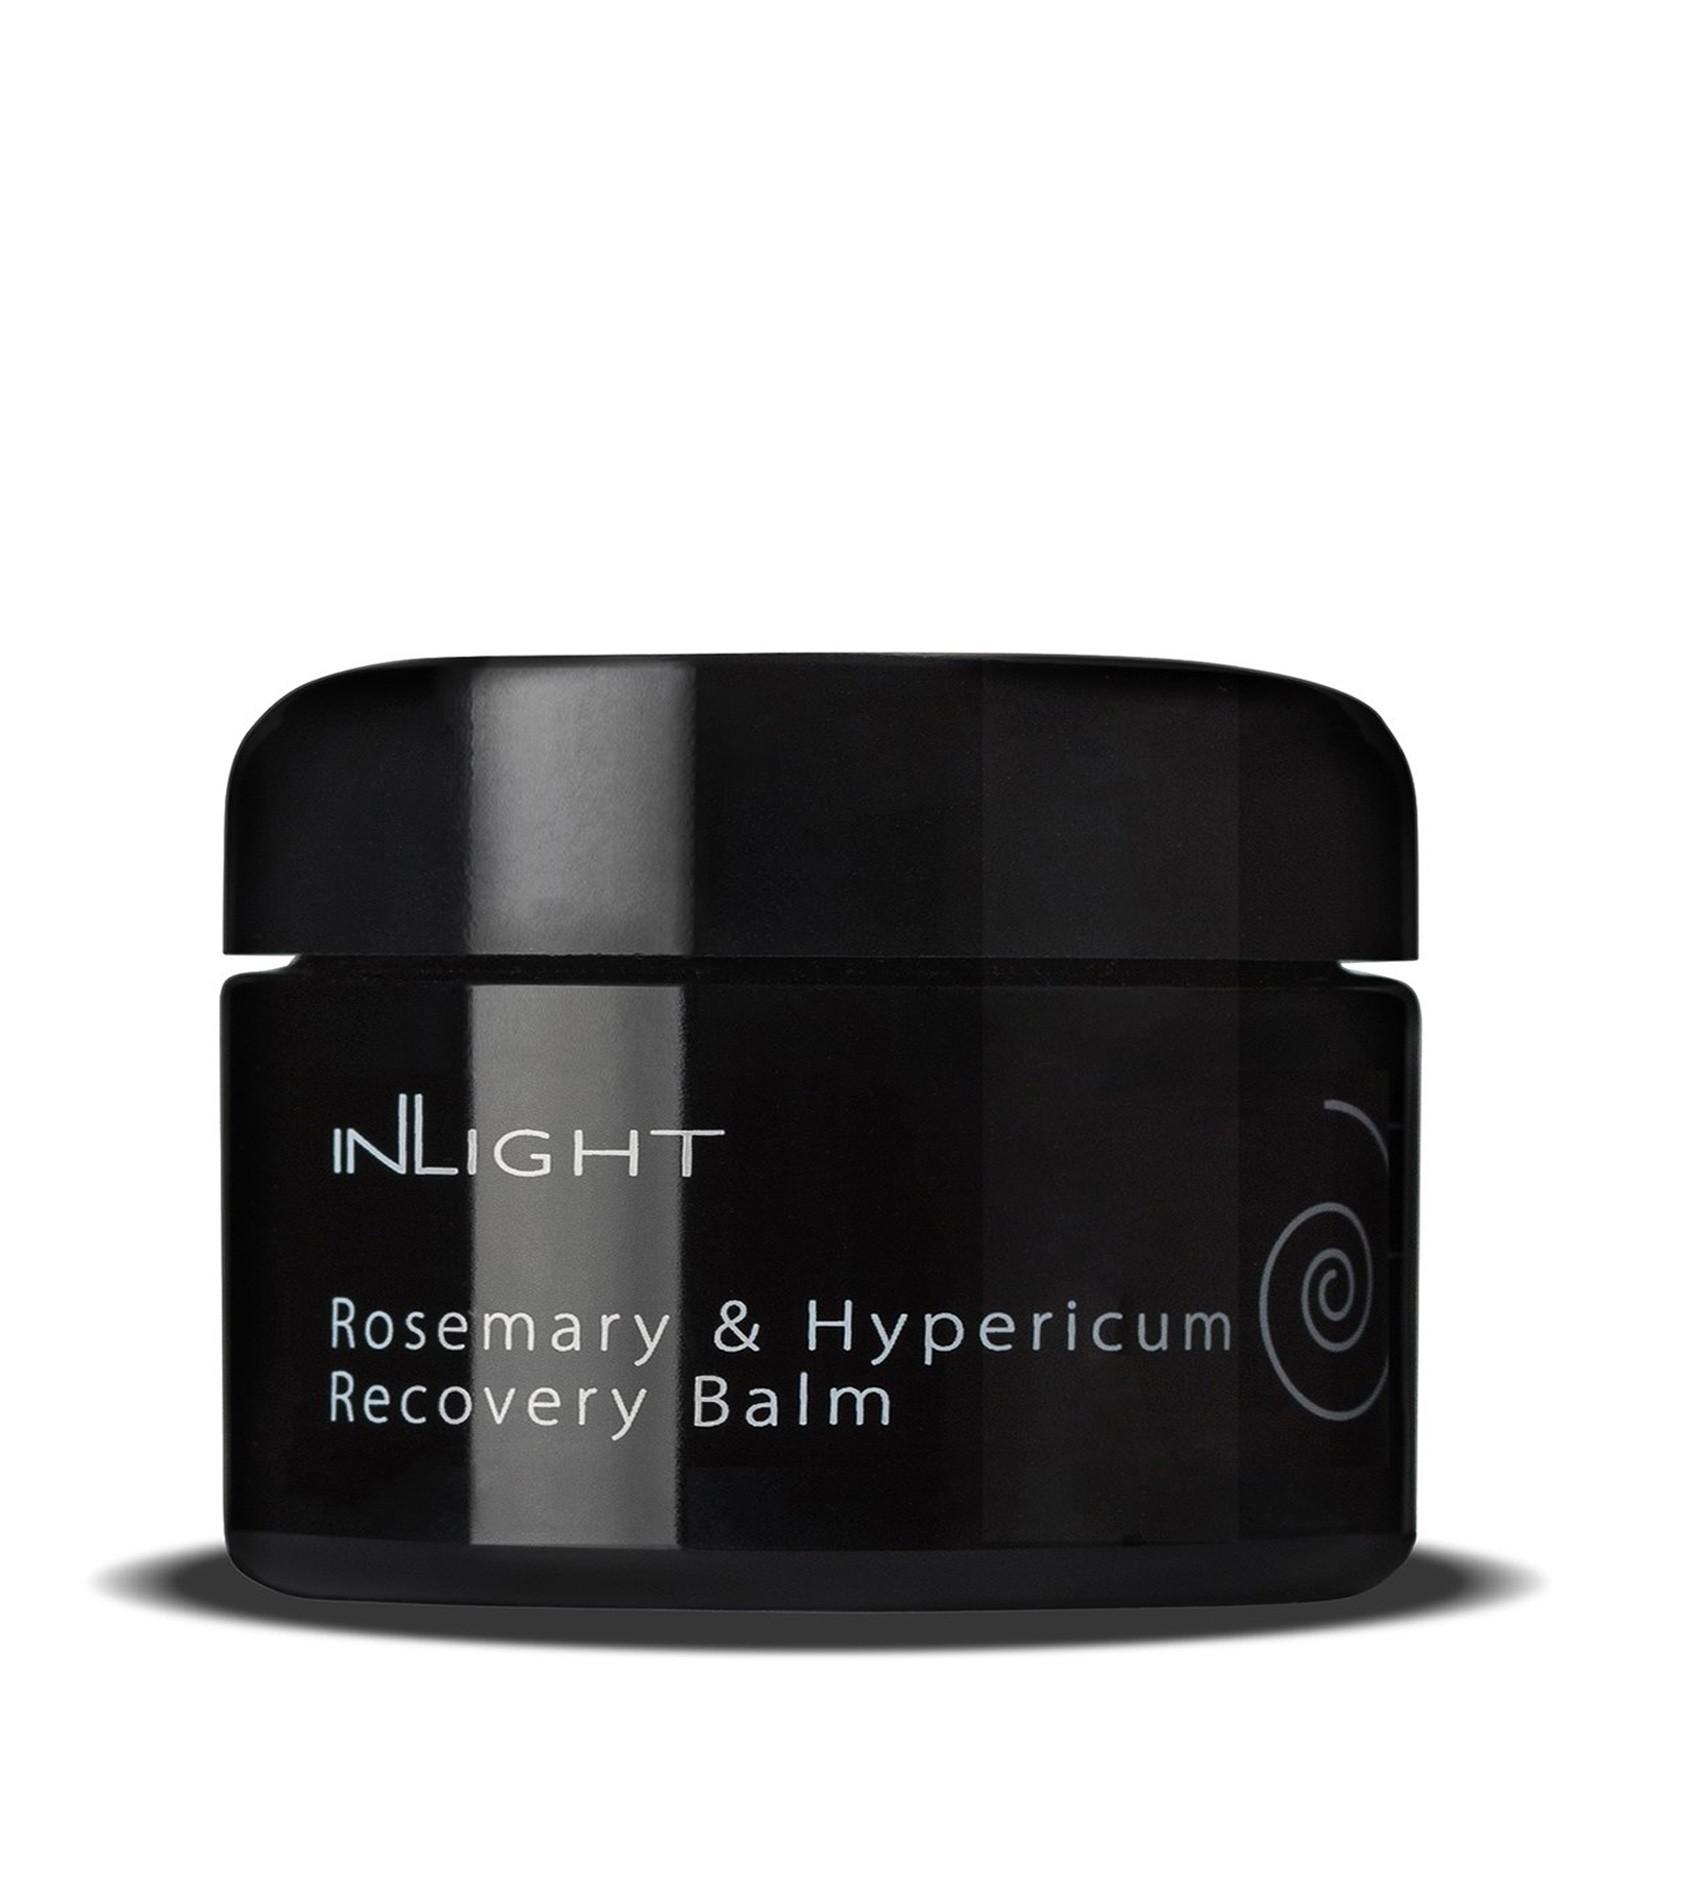 Inlight Rosemary & Hypericum Recovery Balm